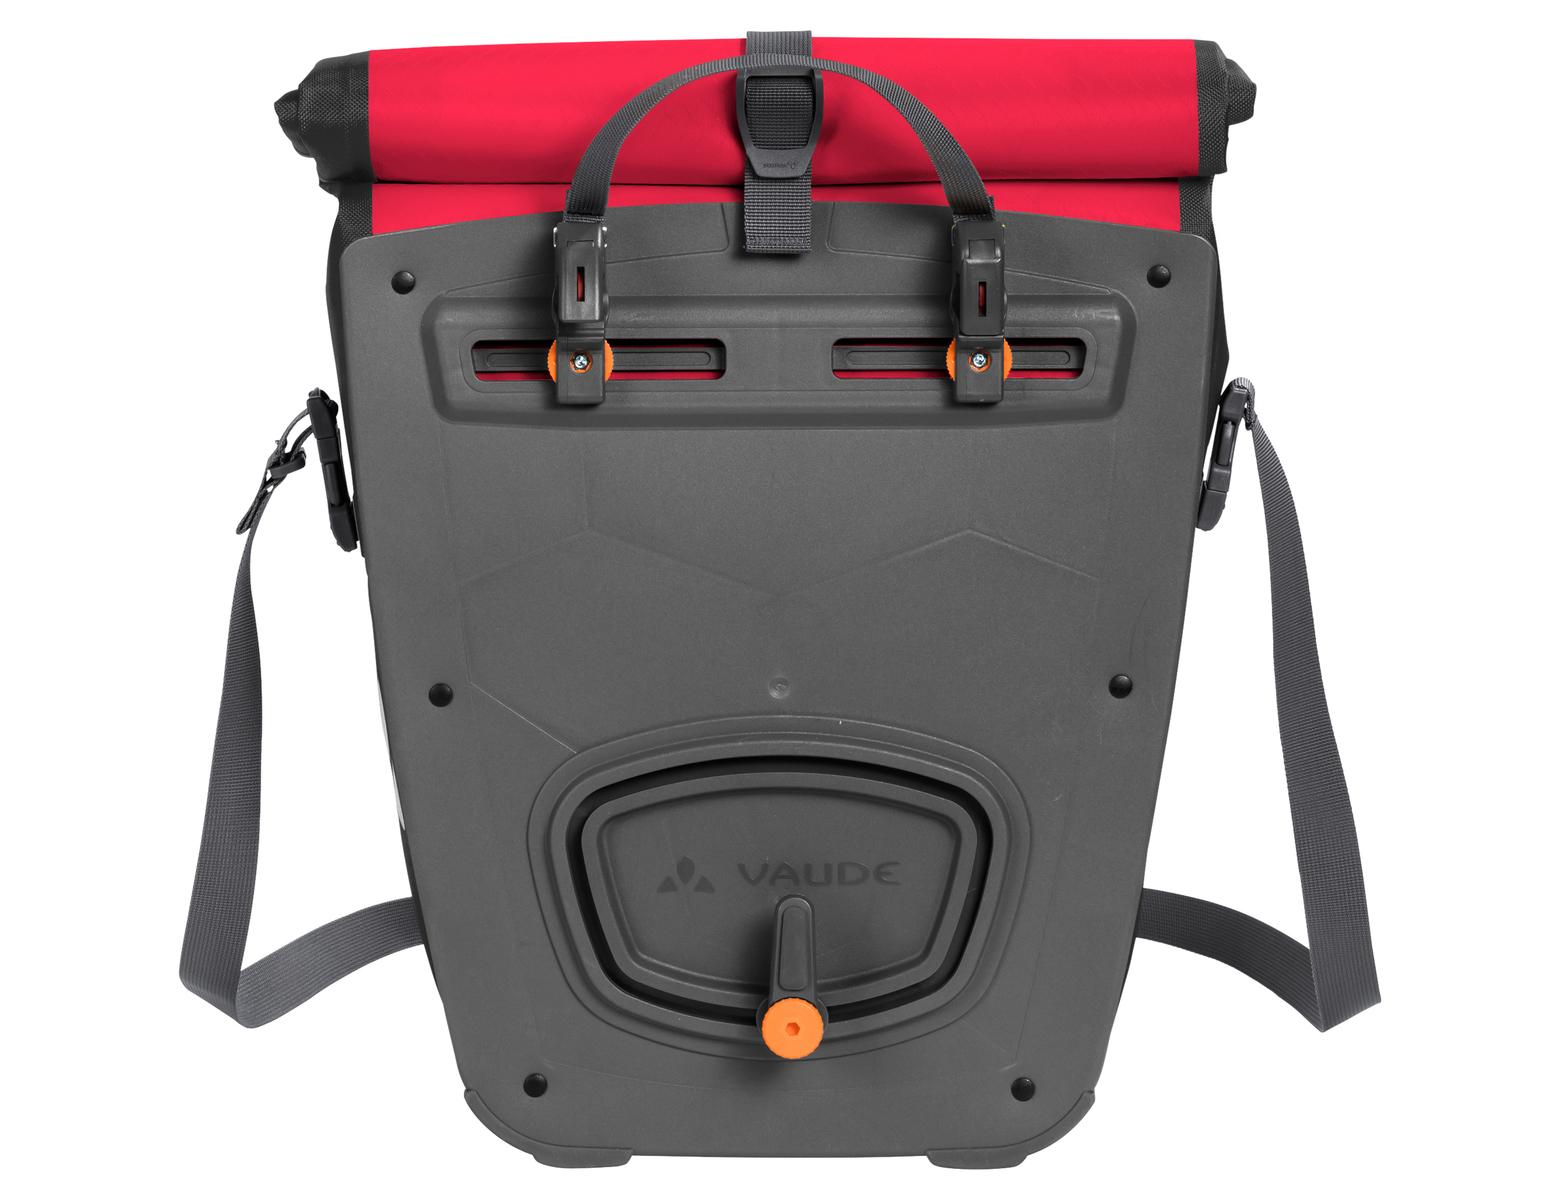 Fahrradtasche Aqua Back  Made in Germany 48 Liter - Red